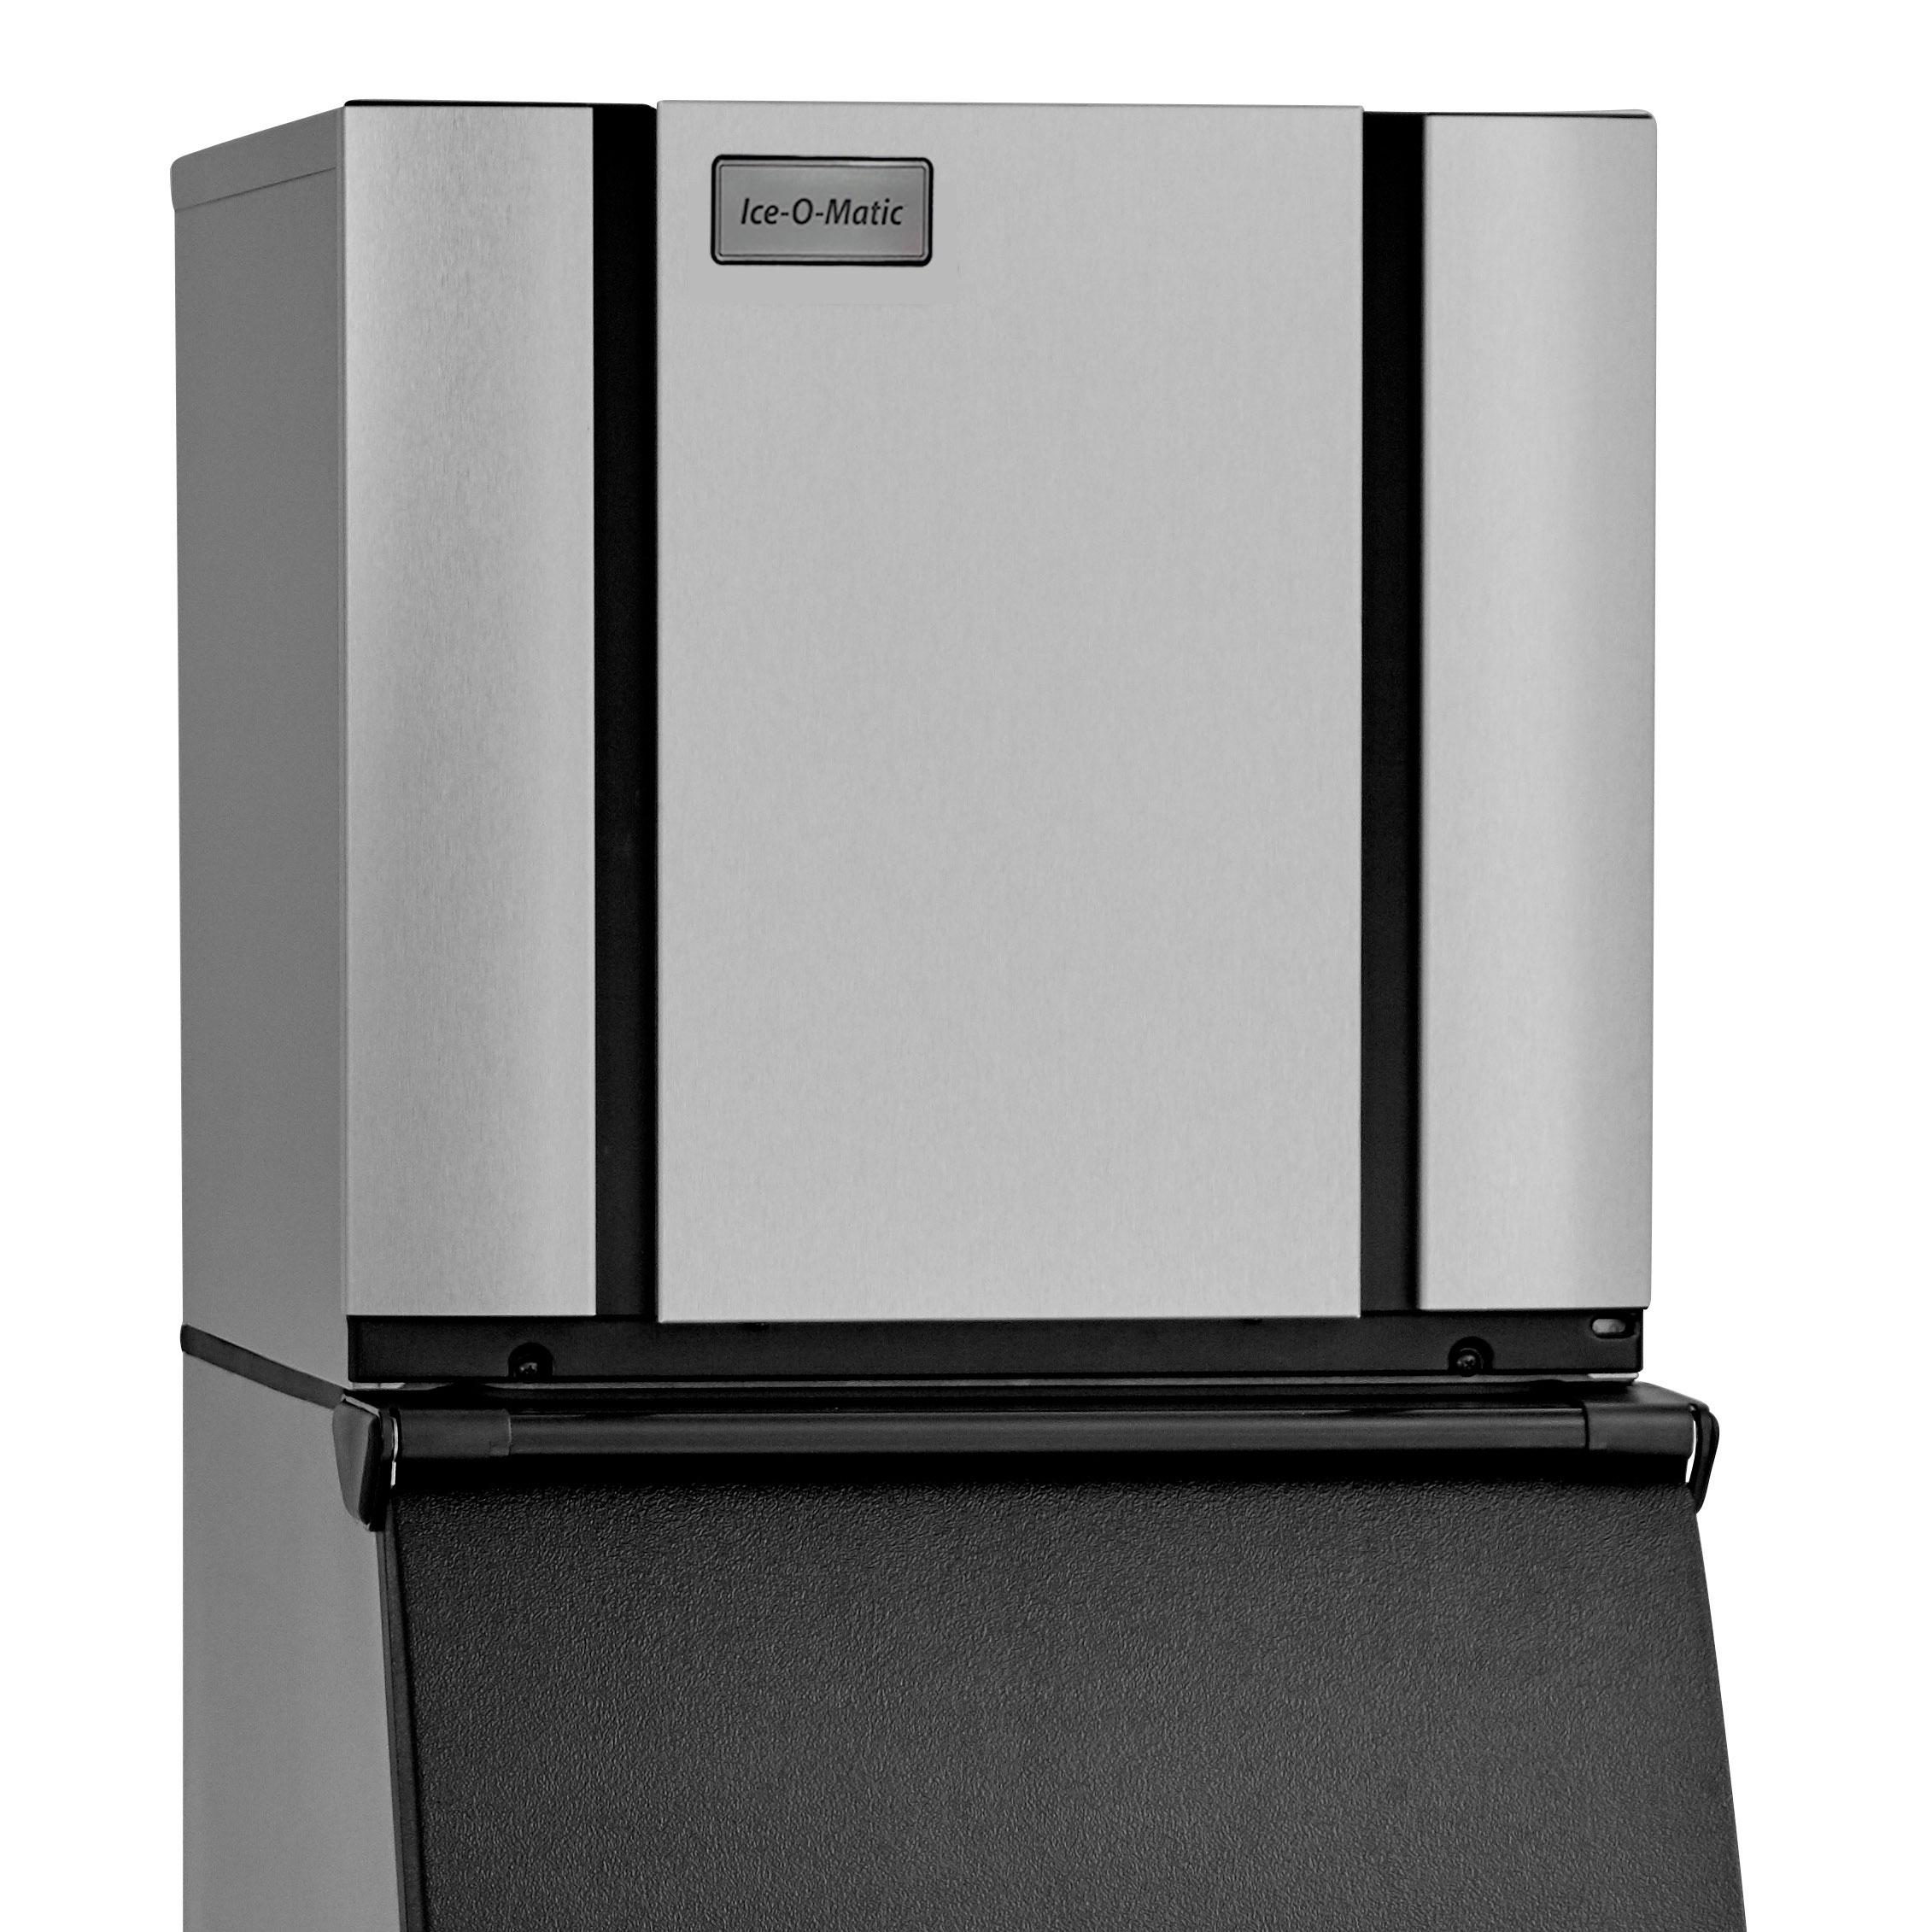 Ice-O-Matic CIM1126FW ice maker, cube-style